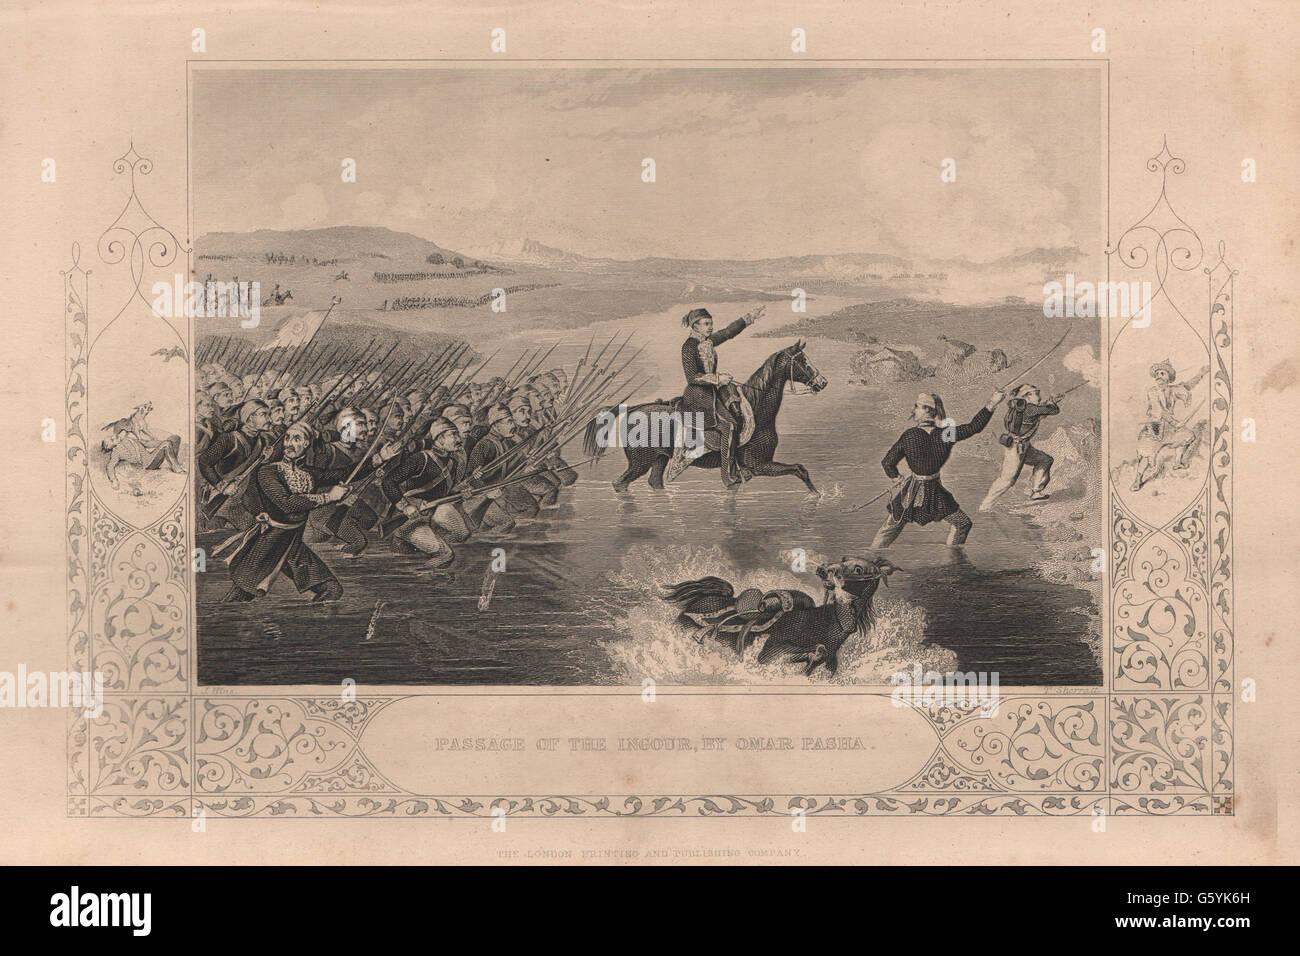 CRIMEAN WAR: Passage of the Ingour (Inguri) by Omar Pasha. Georgia, print 1860 - Stock Image